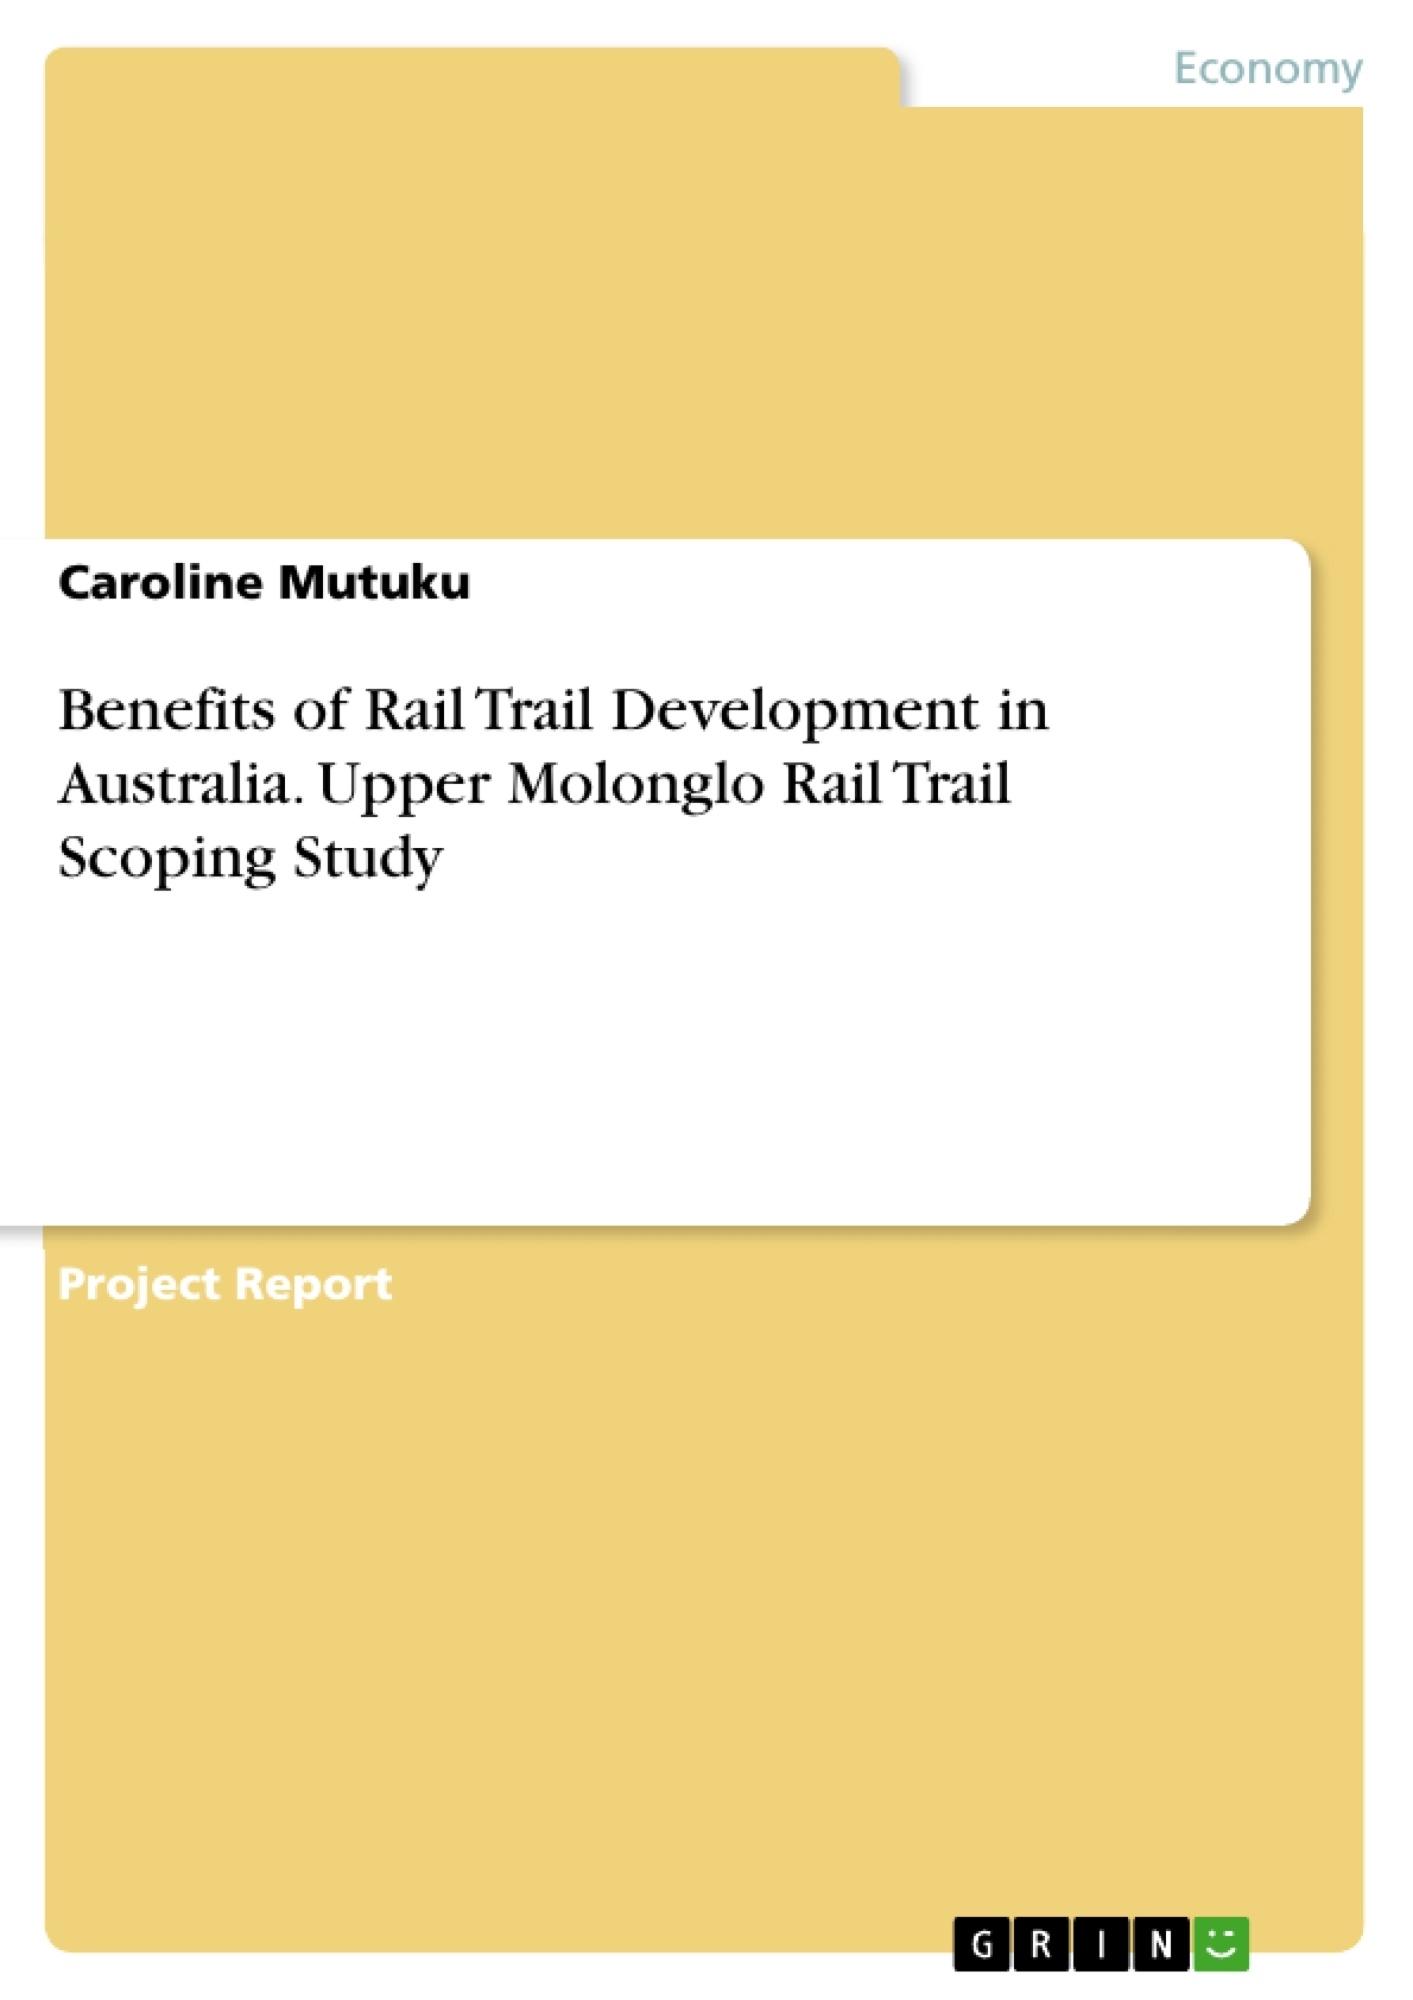 Title: Benefits of Rail Trail Development in Australia. Upper Molonglo Rail Trail Scoping Study